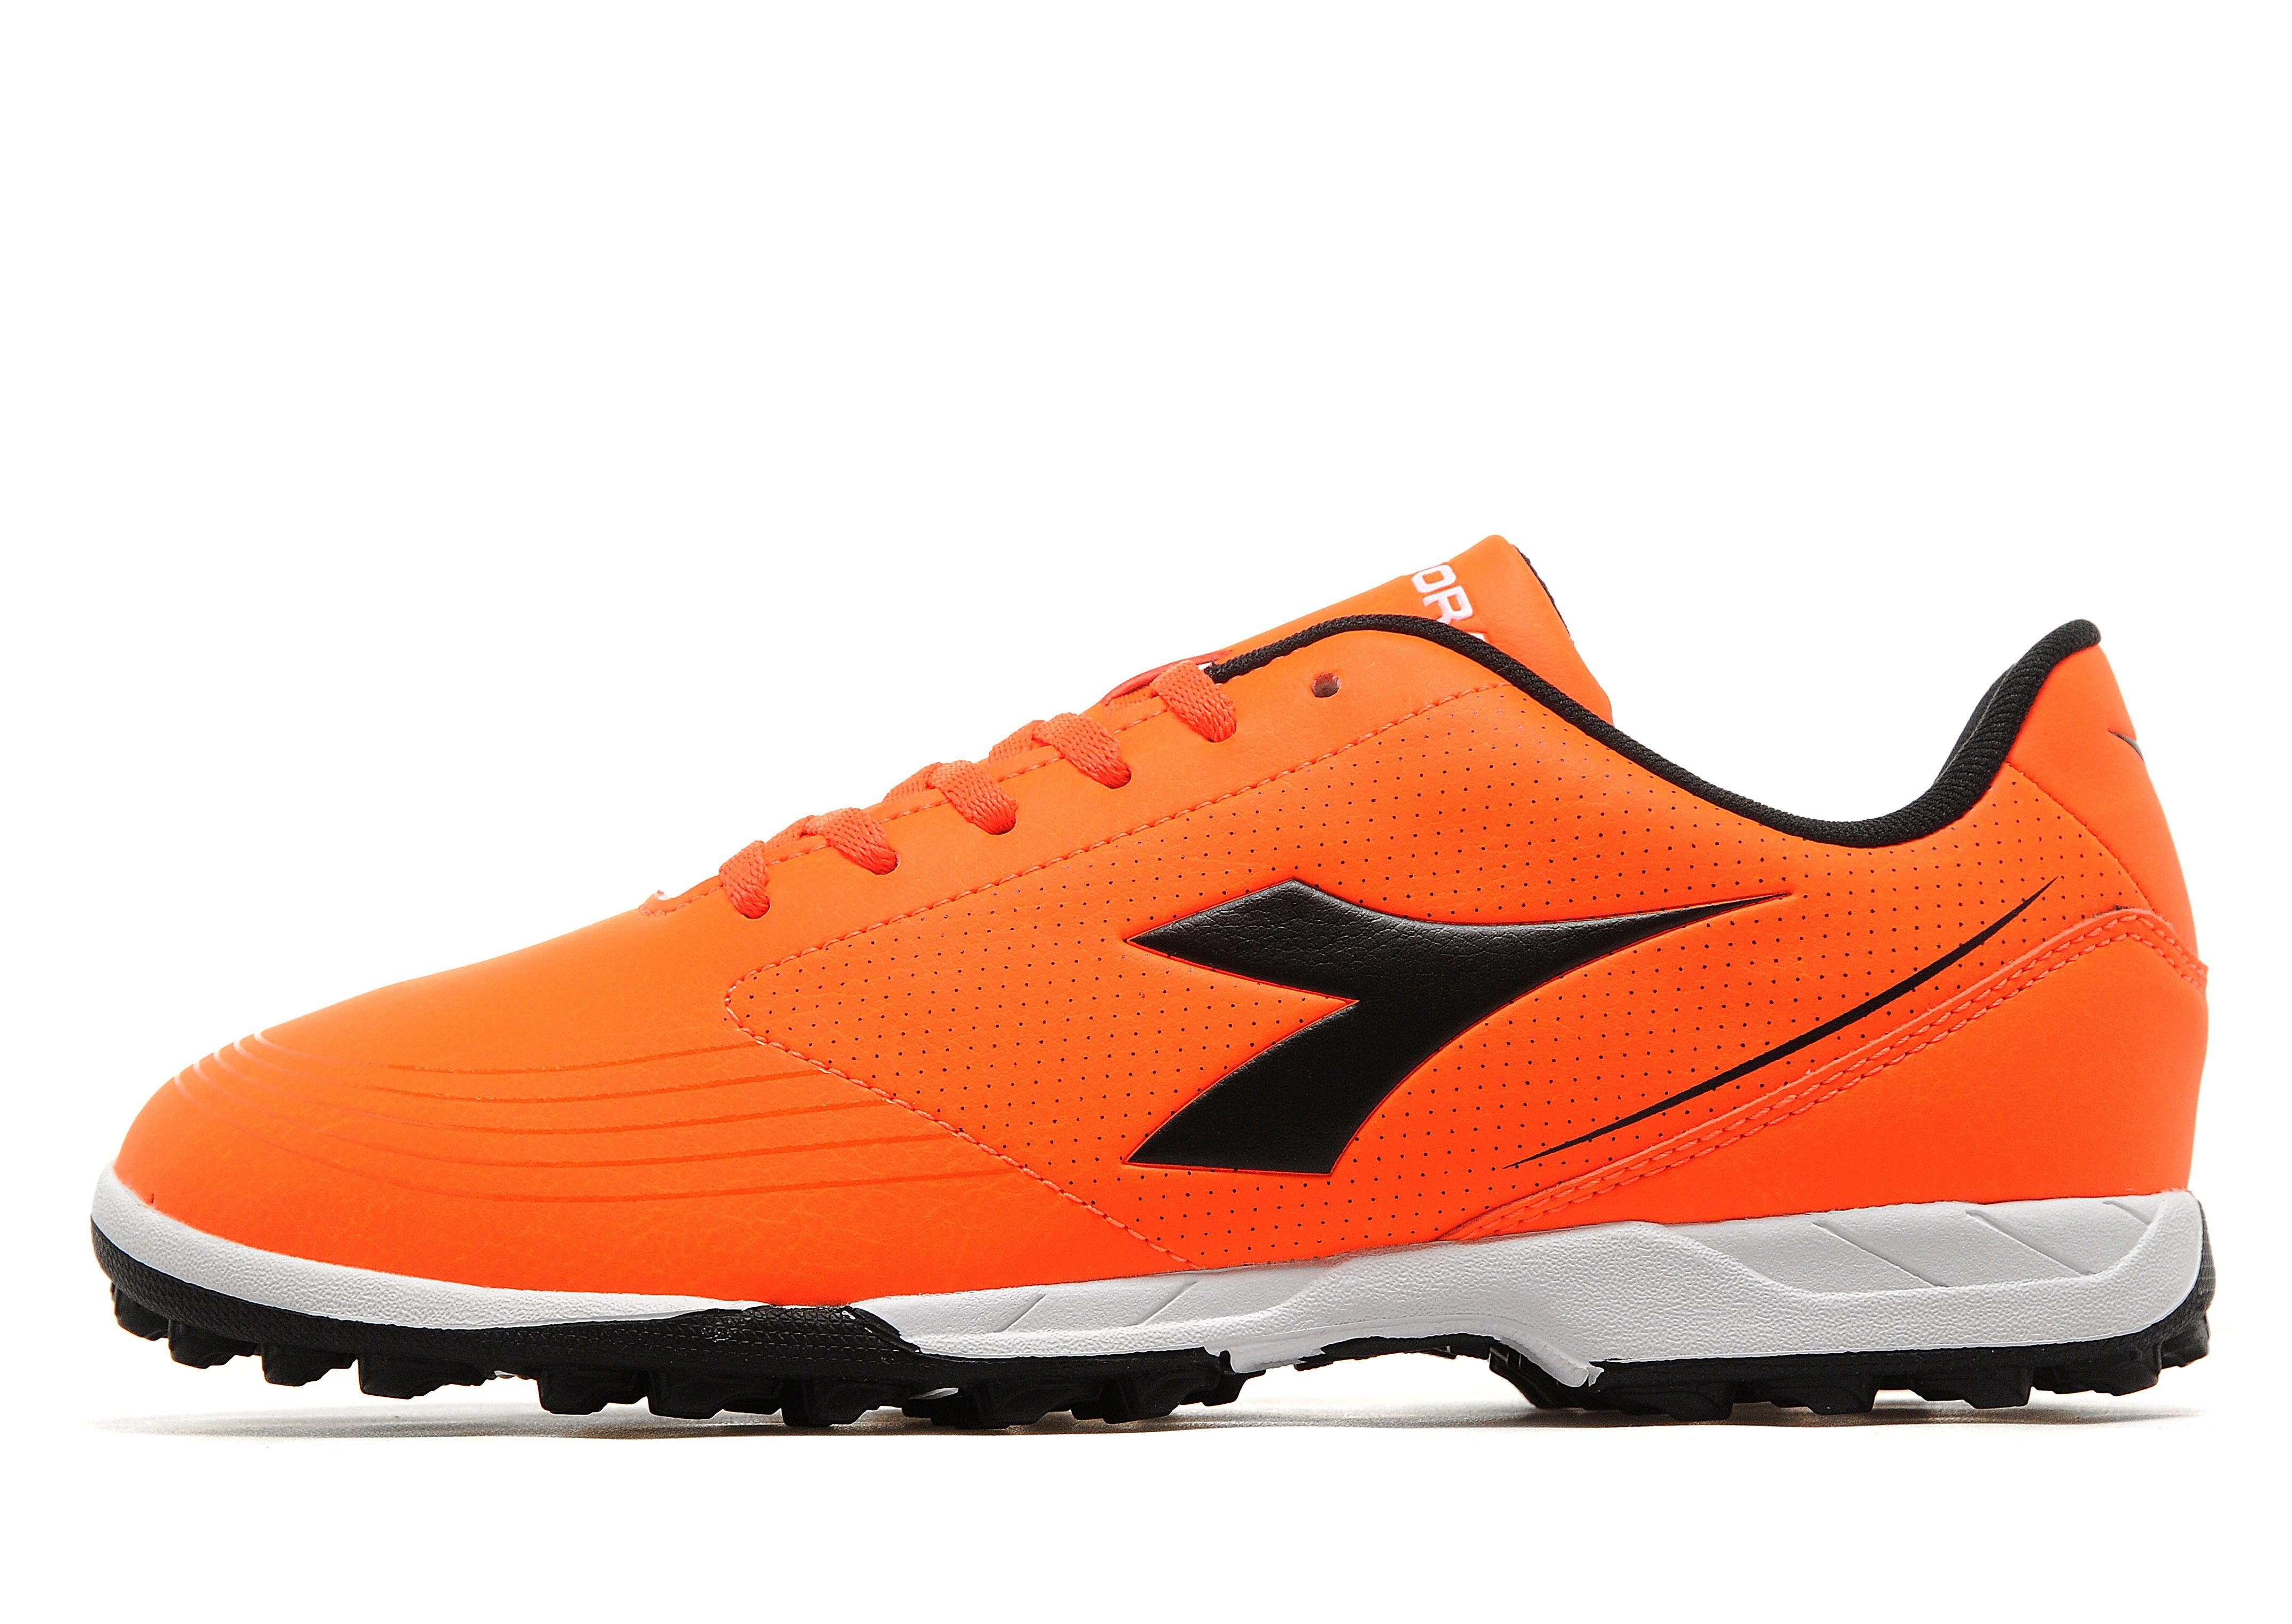 Diadora 750 Turf Football Boots